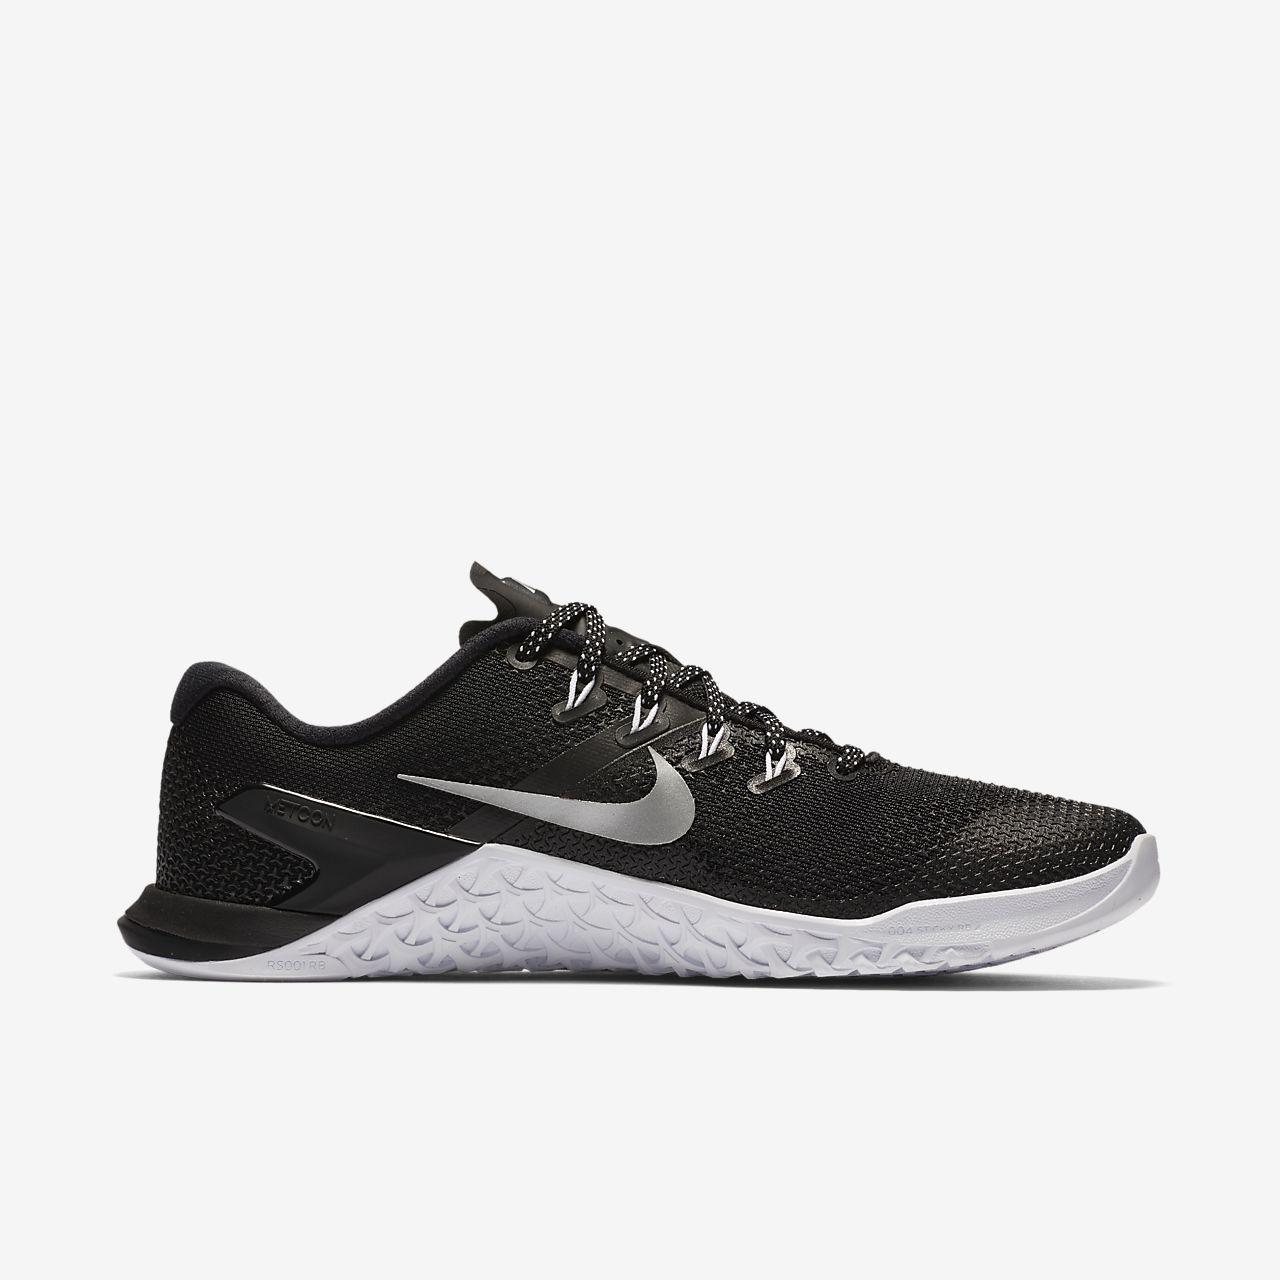 4b41d4f8a08 Calzado de cross training y levantamiento de pesas para mujer Nike ...